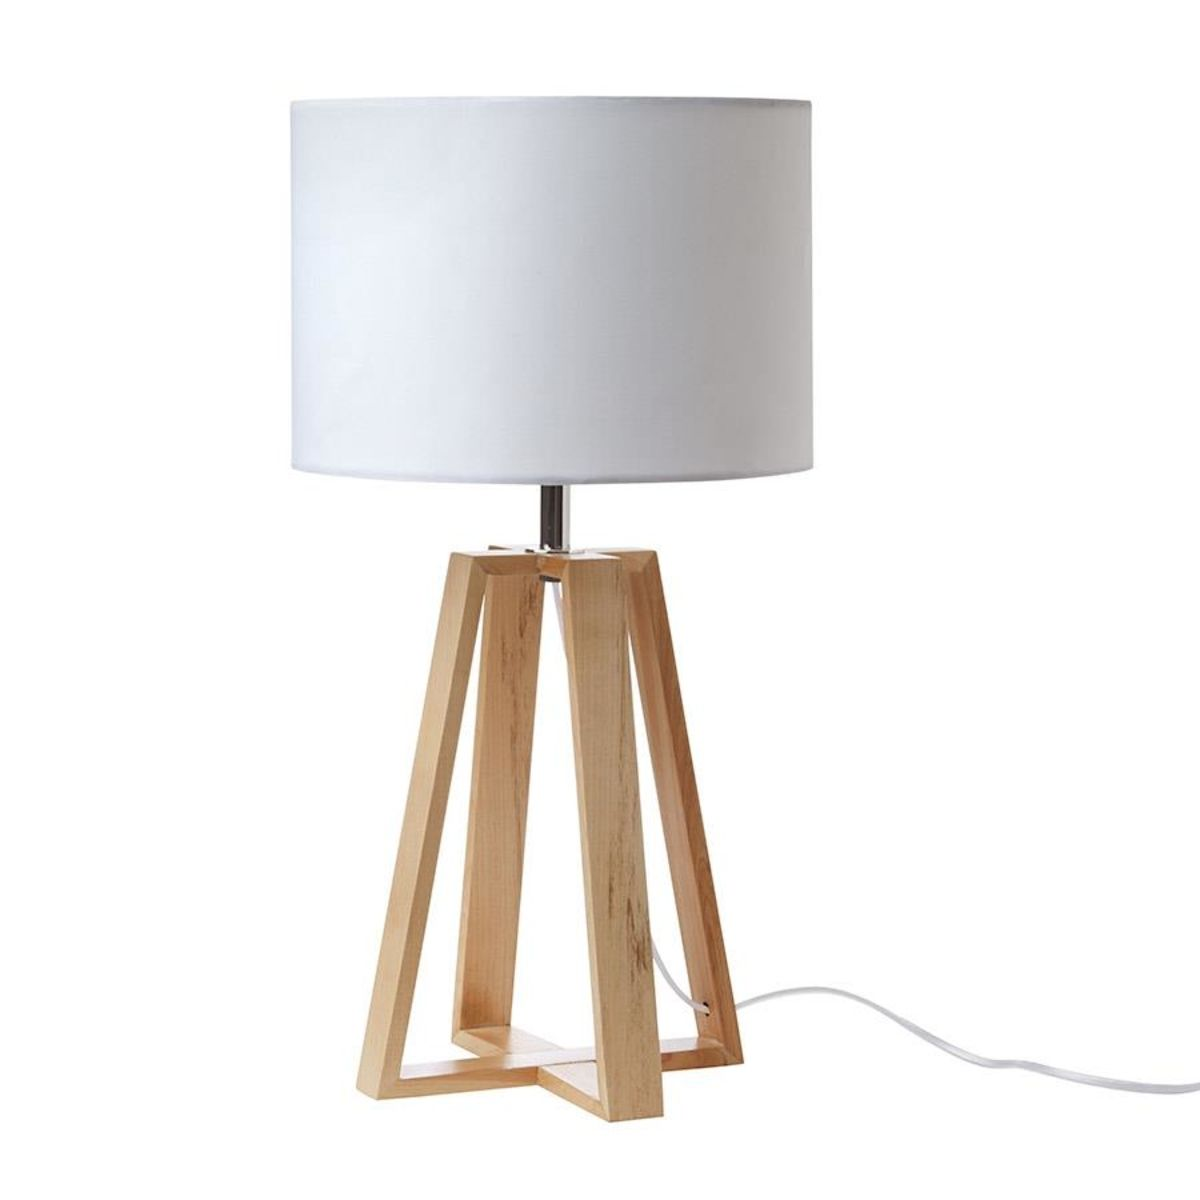 $22 Wooden Table Lamp | KmartNZ